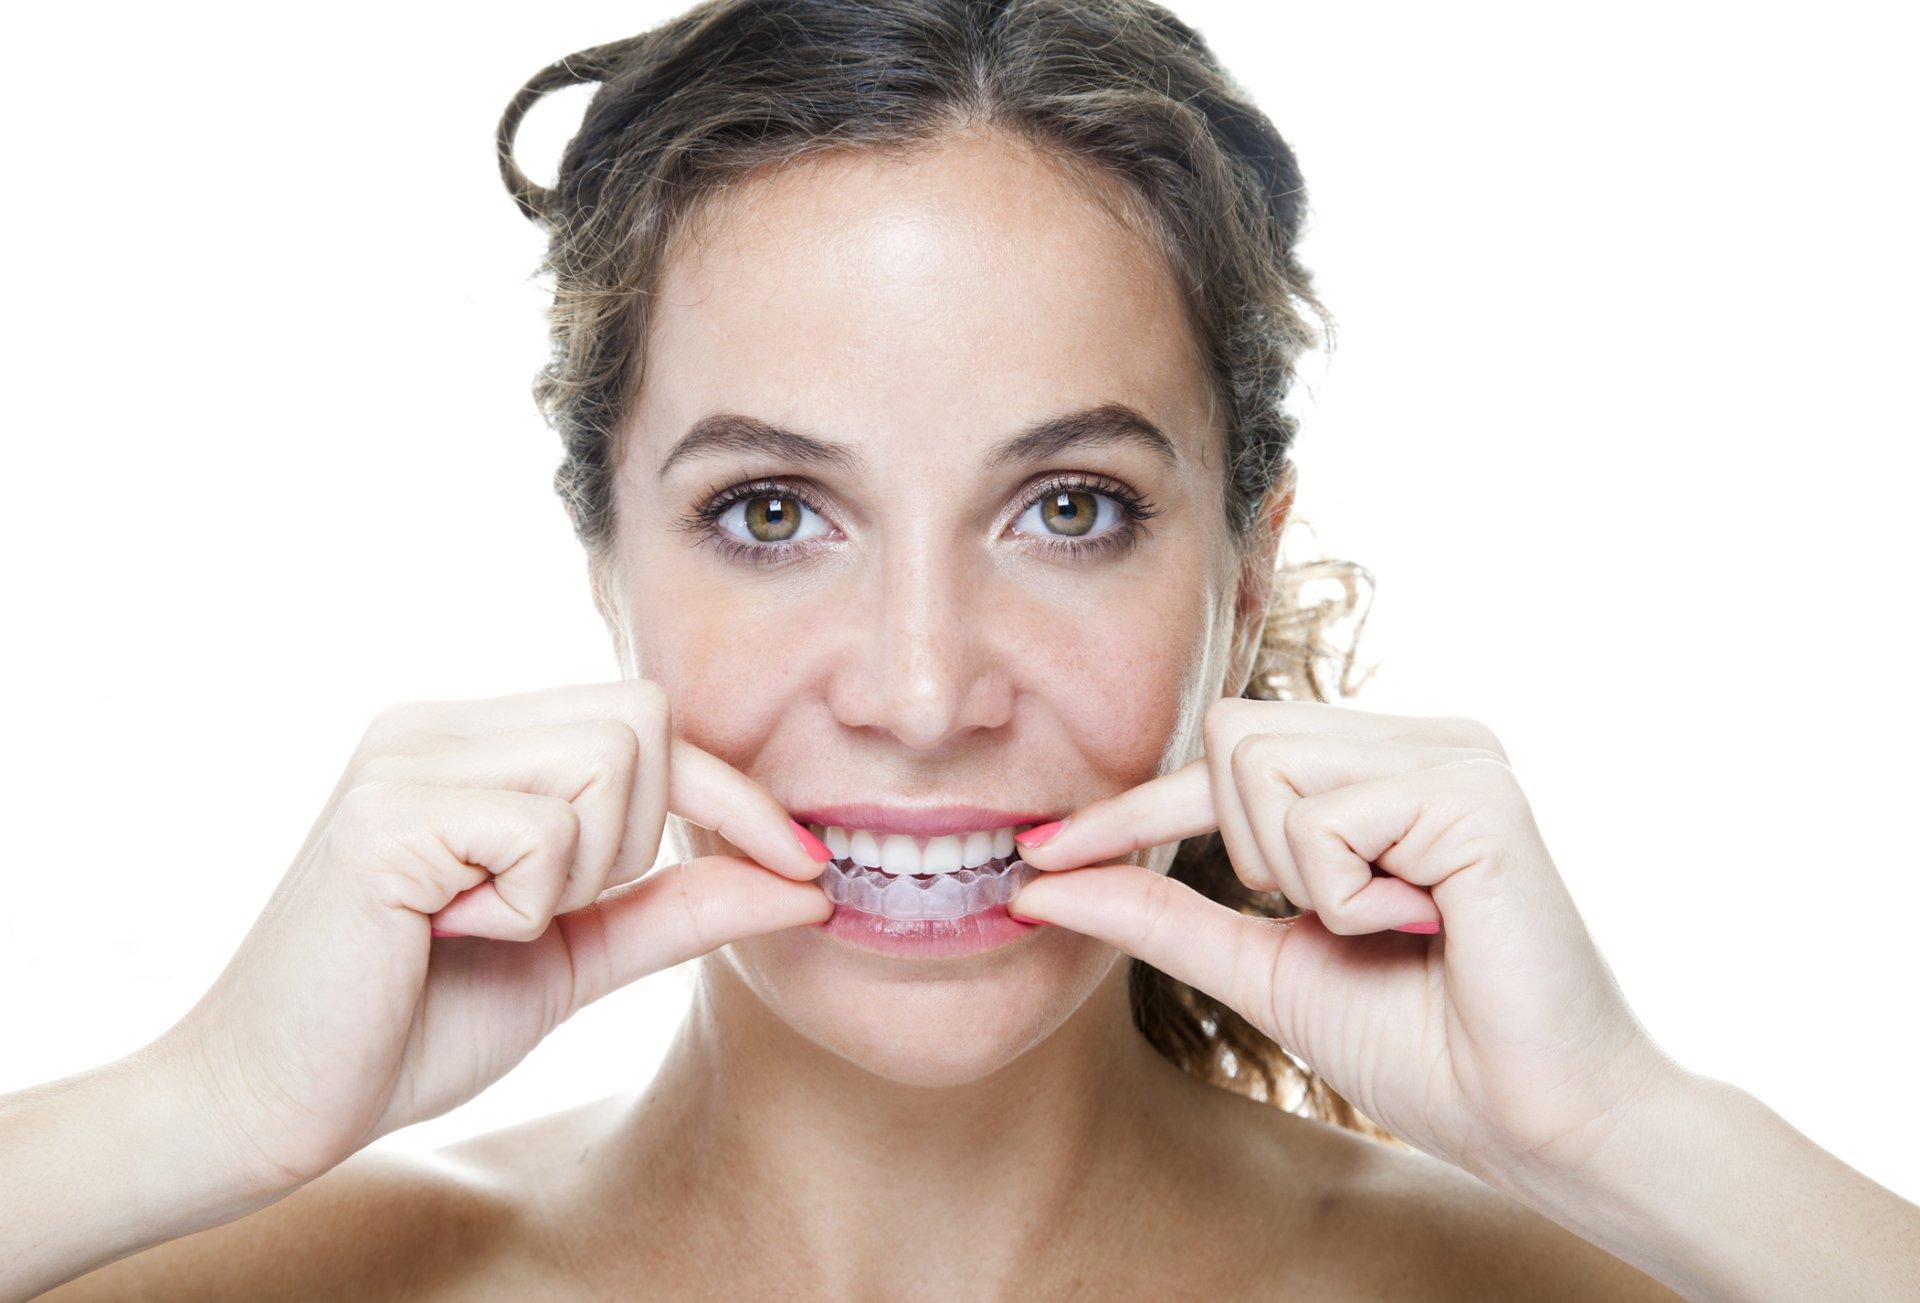 Clinica Odontoiatrica situata tra Novara e Varese | Ortodonzia Invisibile